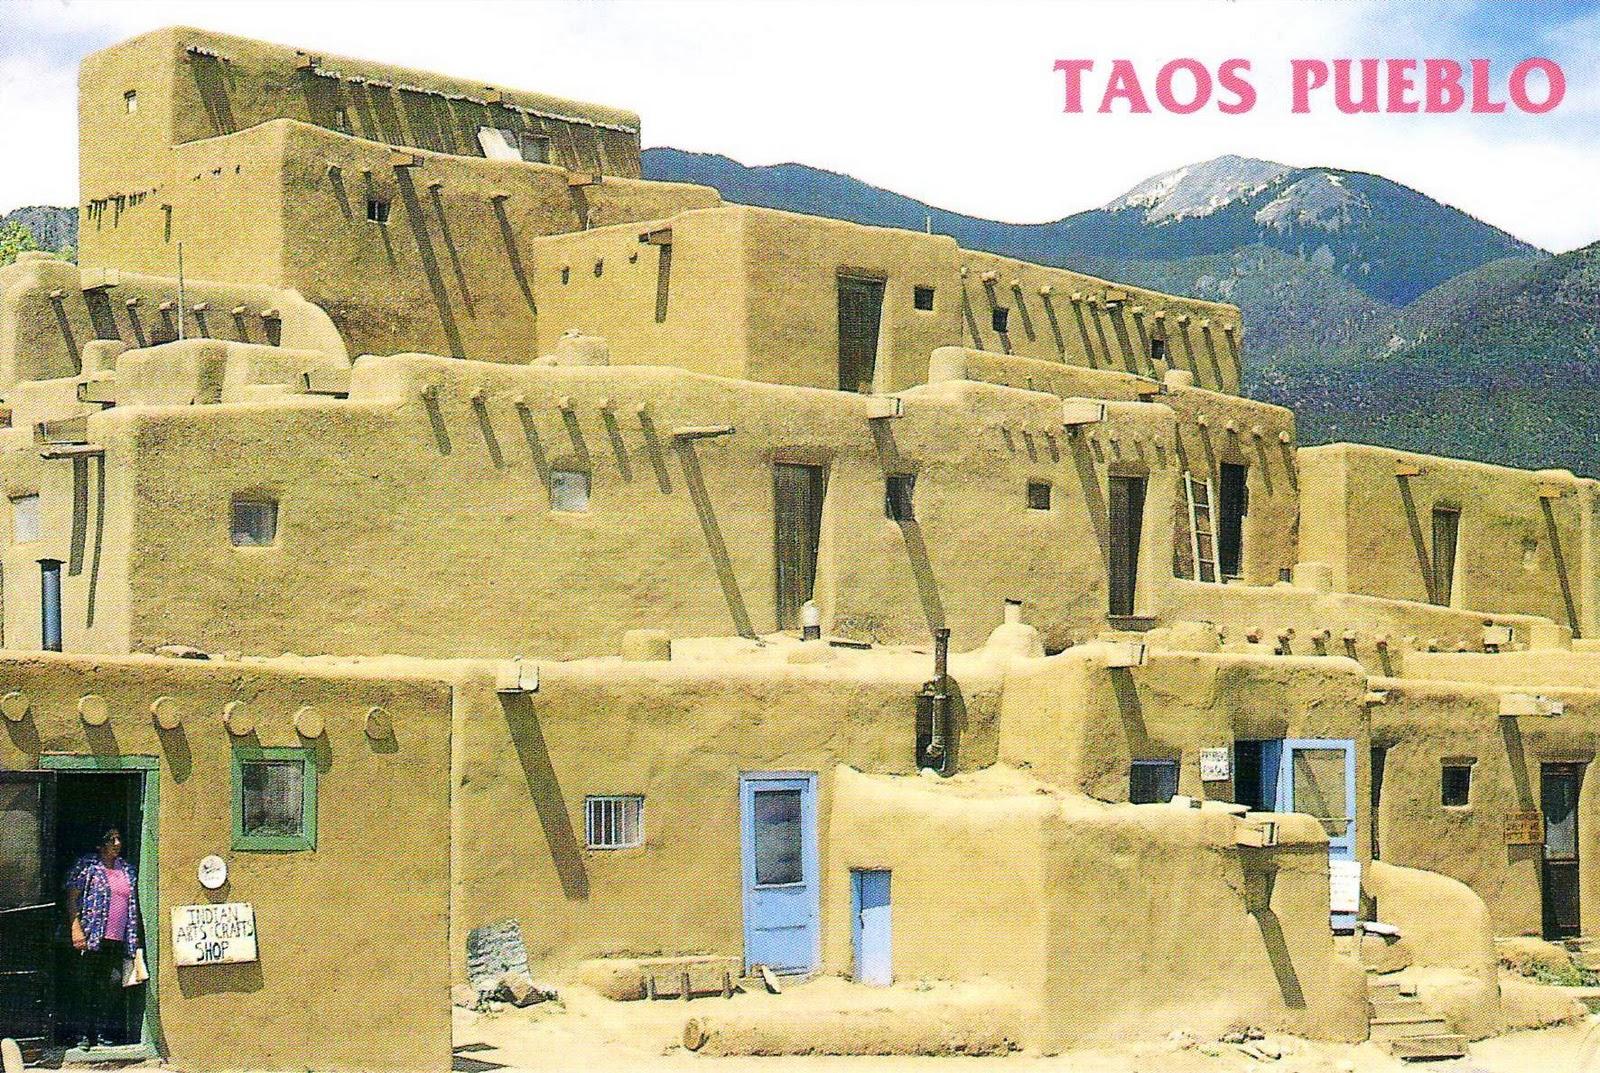 Taos Pueblo In New Mexico, USA Stock Image - Image of ...  |Taos Pueblo New Mexico Usa